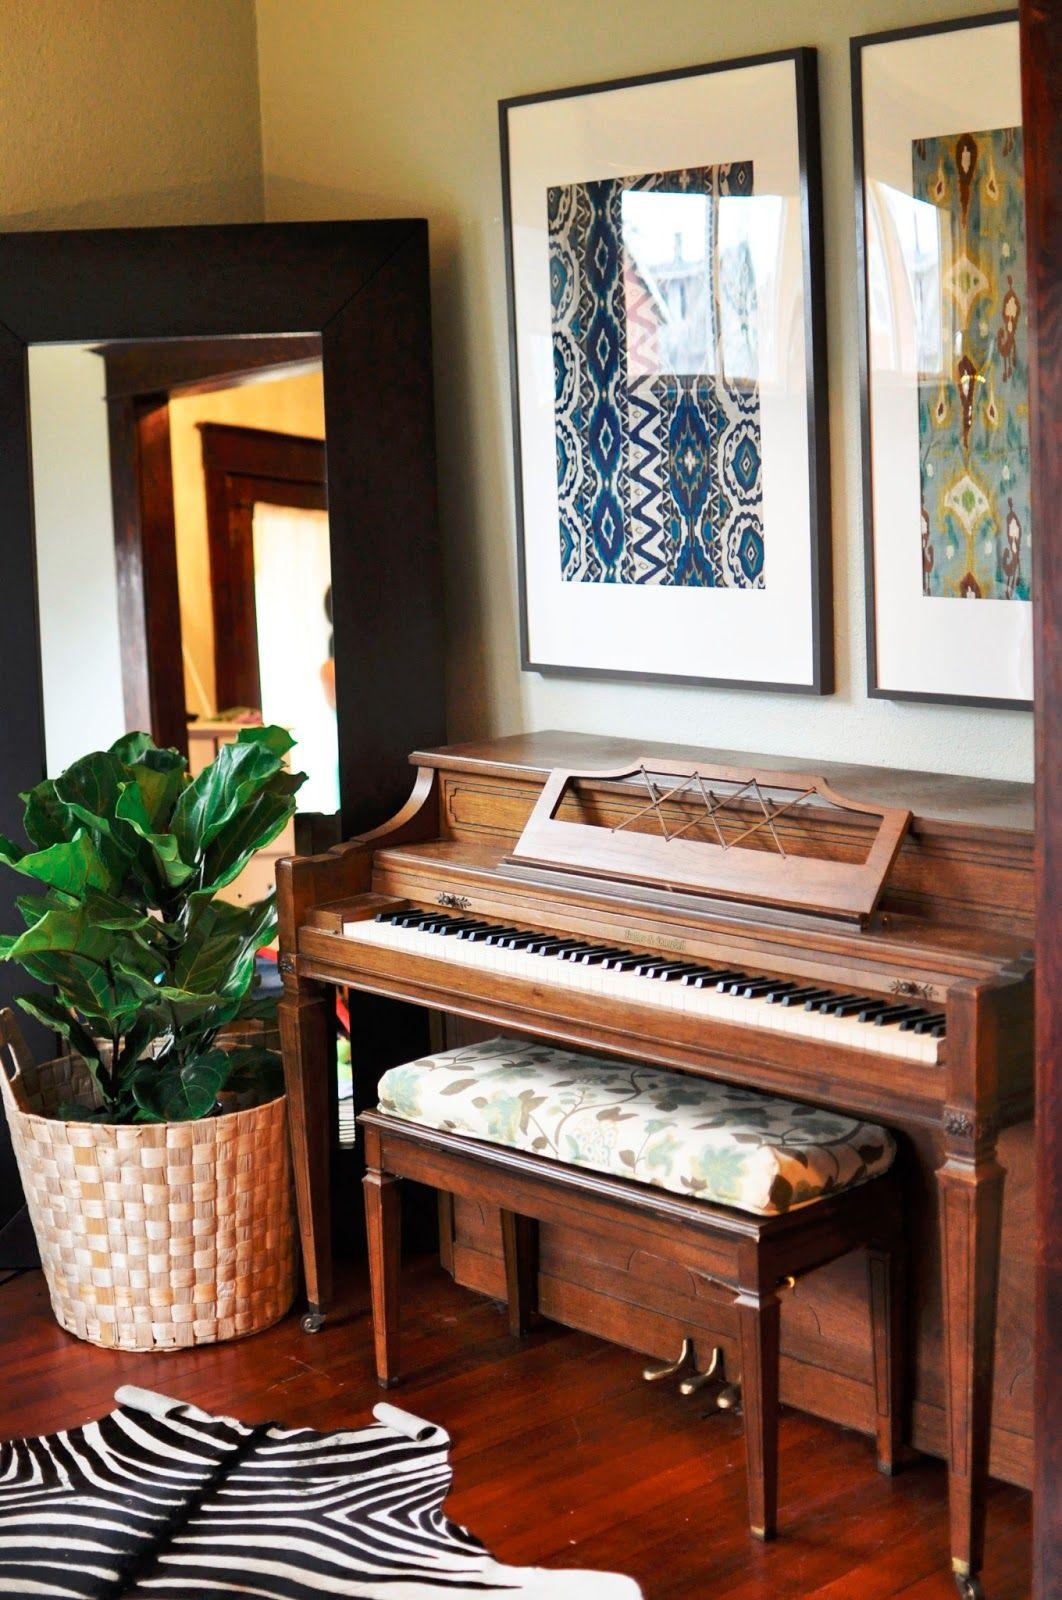 Ikea ribba frames zebra rug fiddle leaf piano room small space